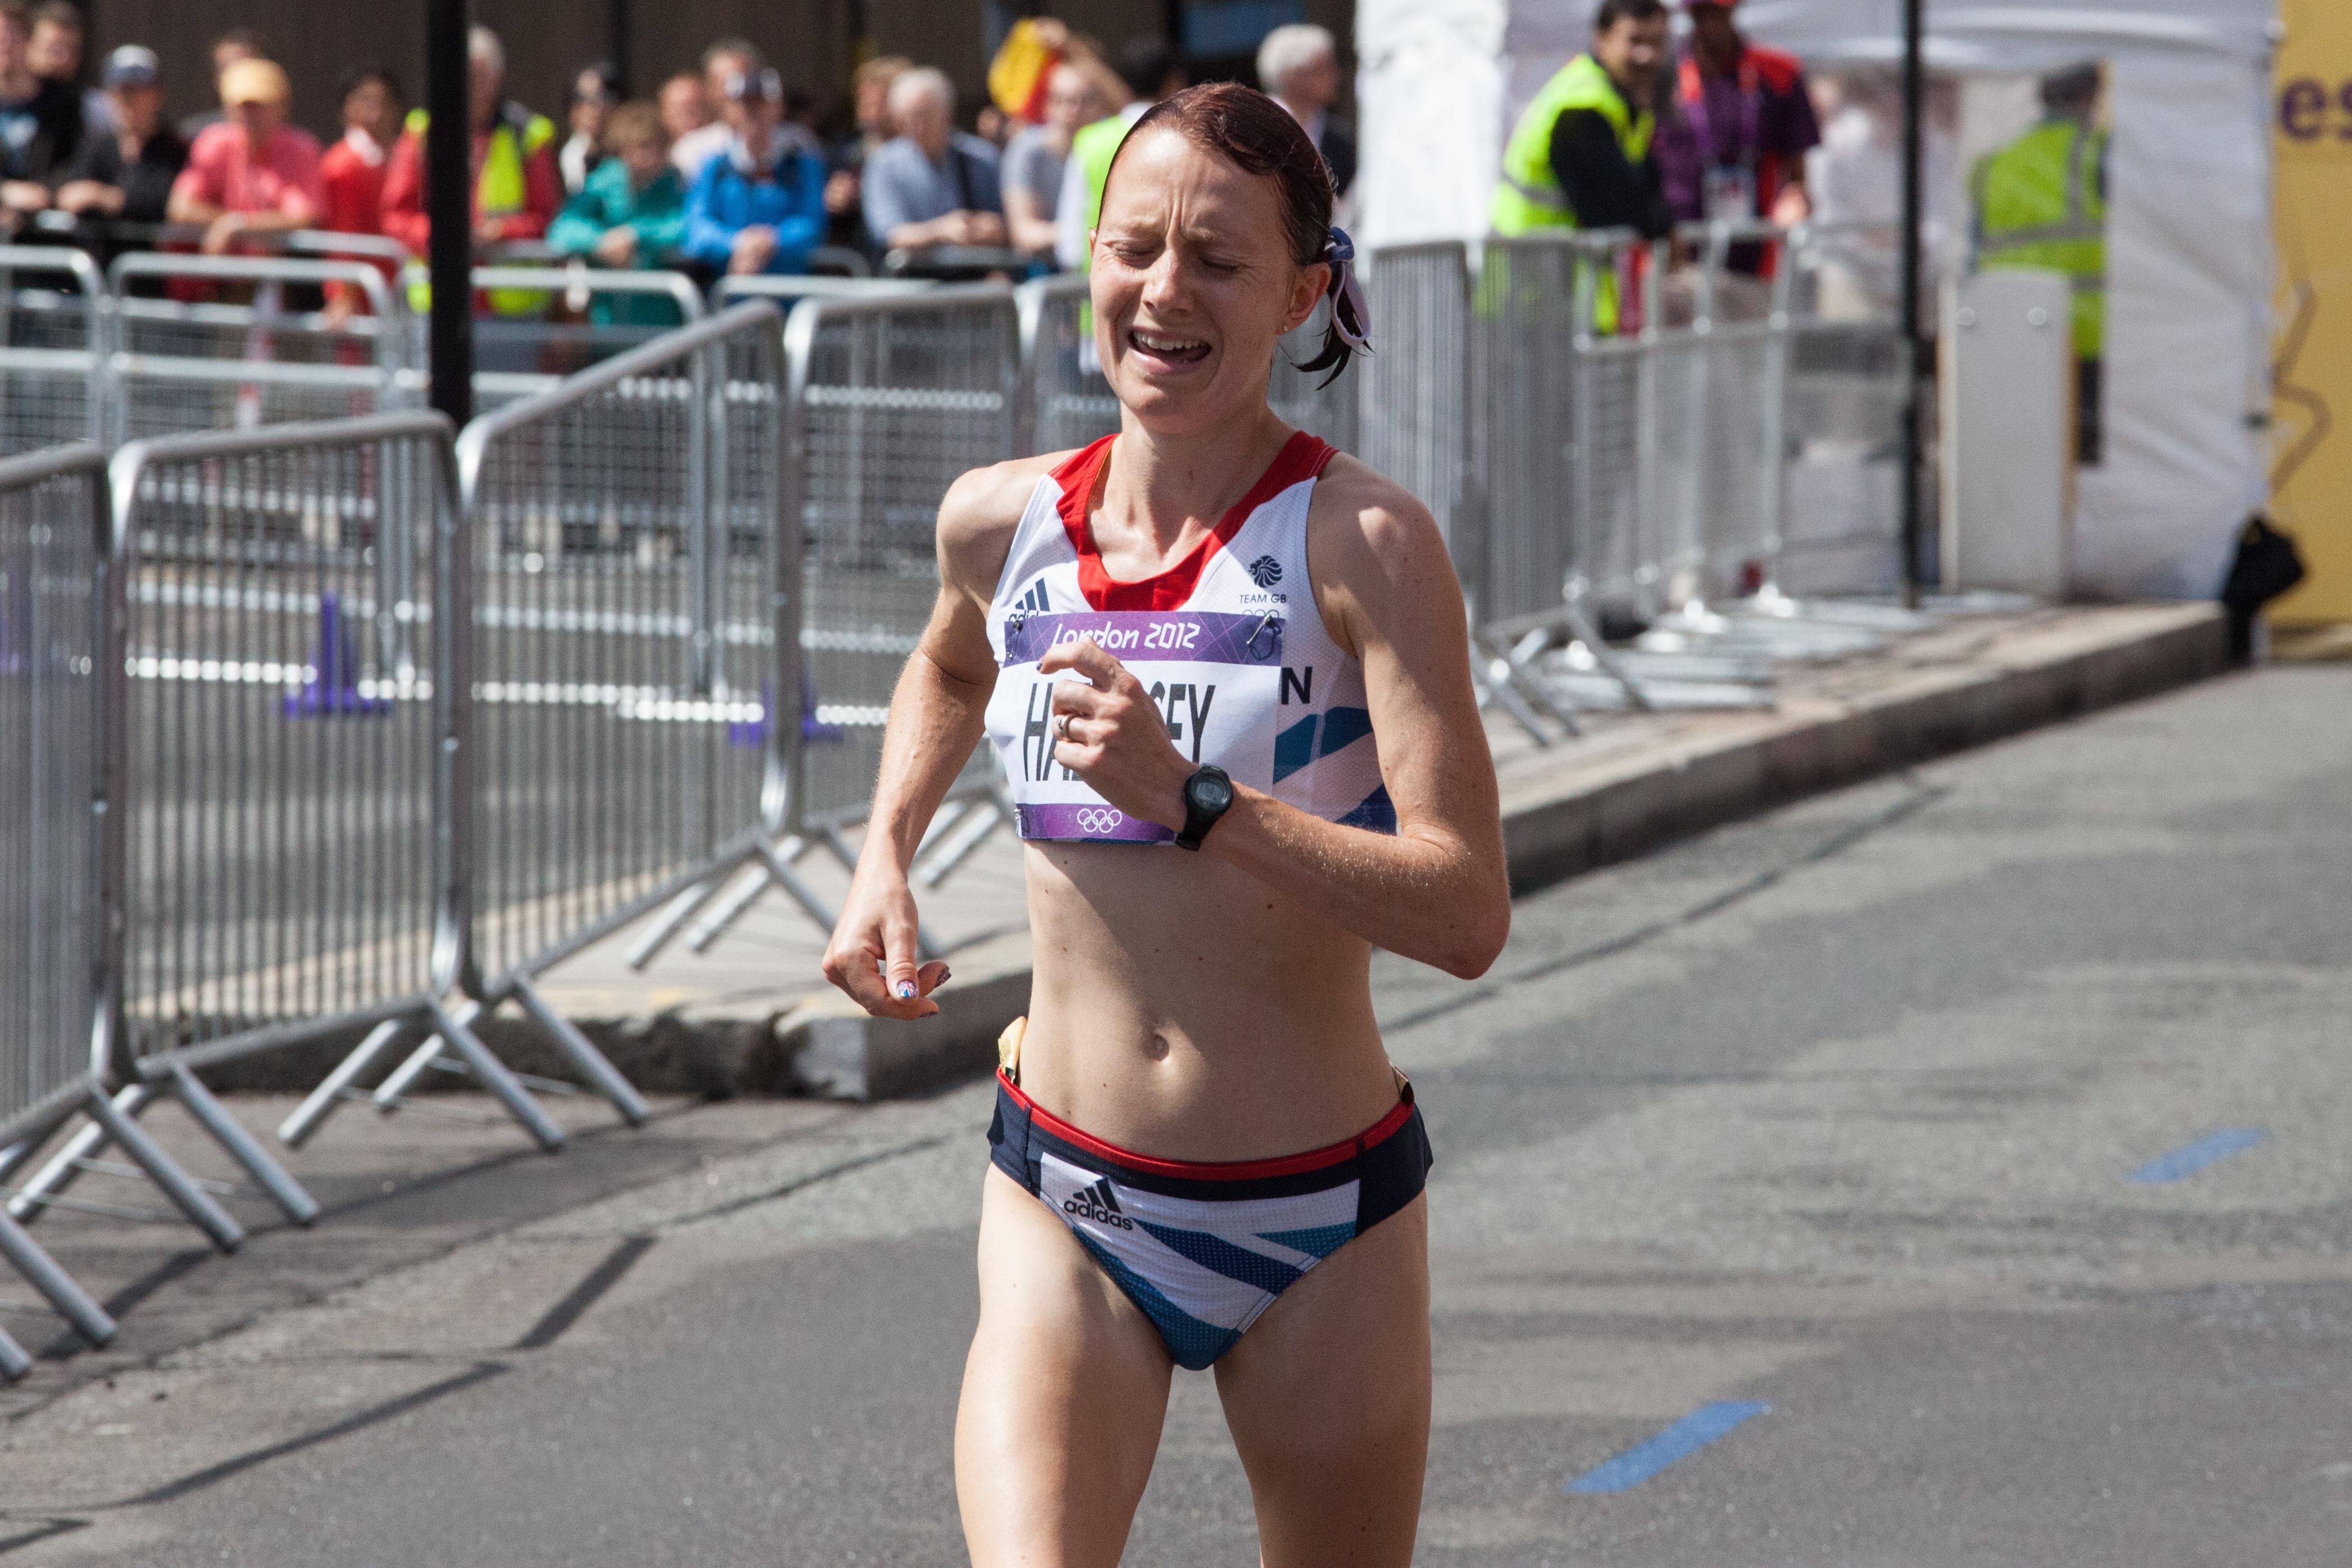 Olympics women pain BME Pain